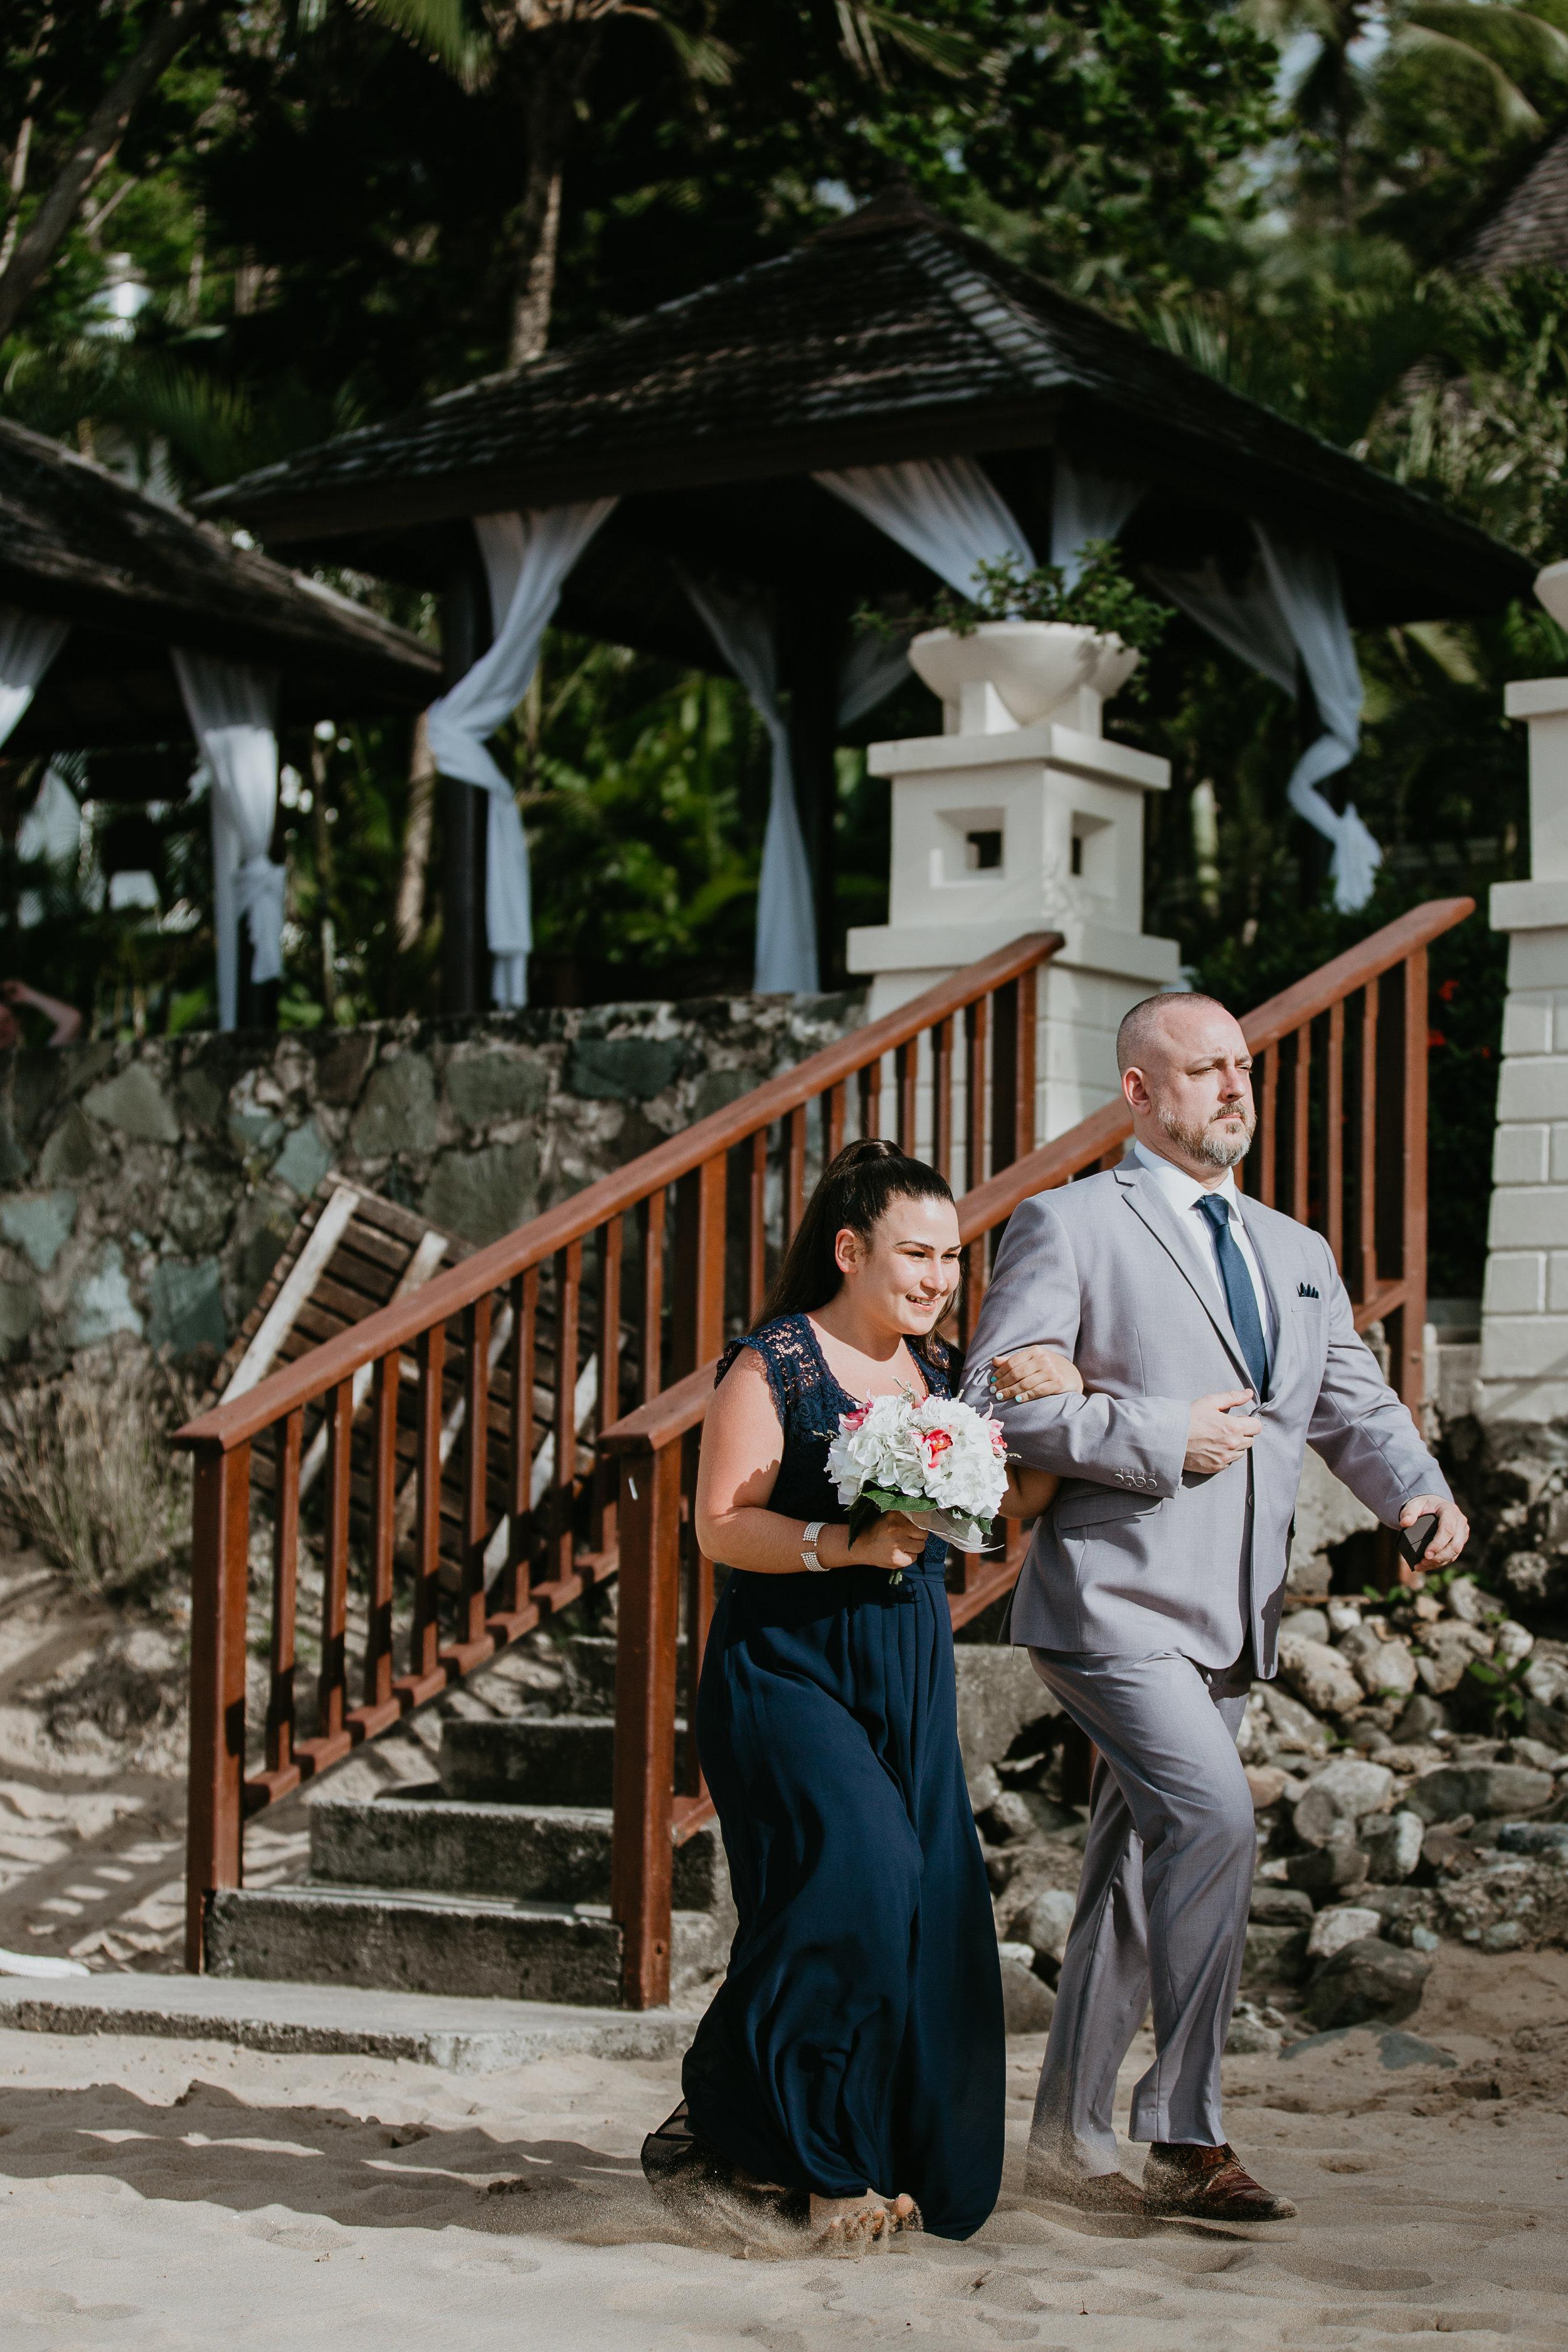 nicole-daacke-photography-destination-wedding-in-st-lucia-sandals-la-toc-intimate-island-wedding-carribean-elopement-photographer-chill-island-wedding-55.jpg